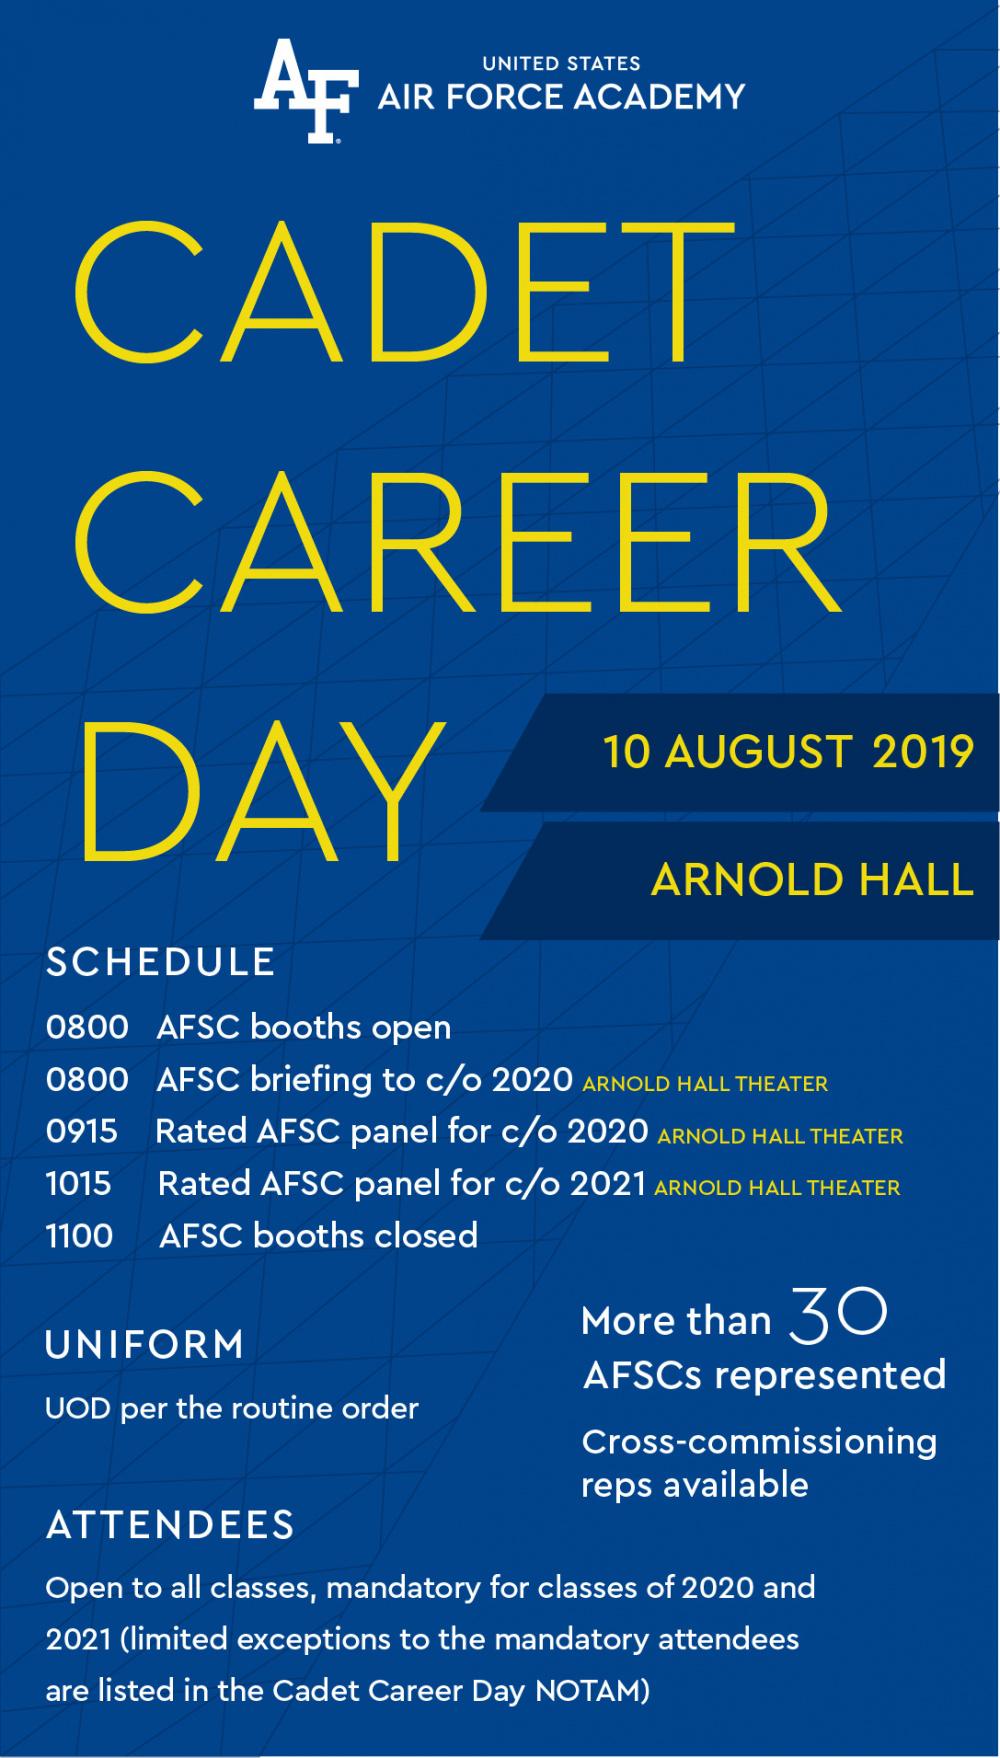 USAFA Cadet Career Day